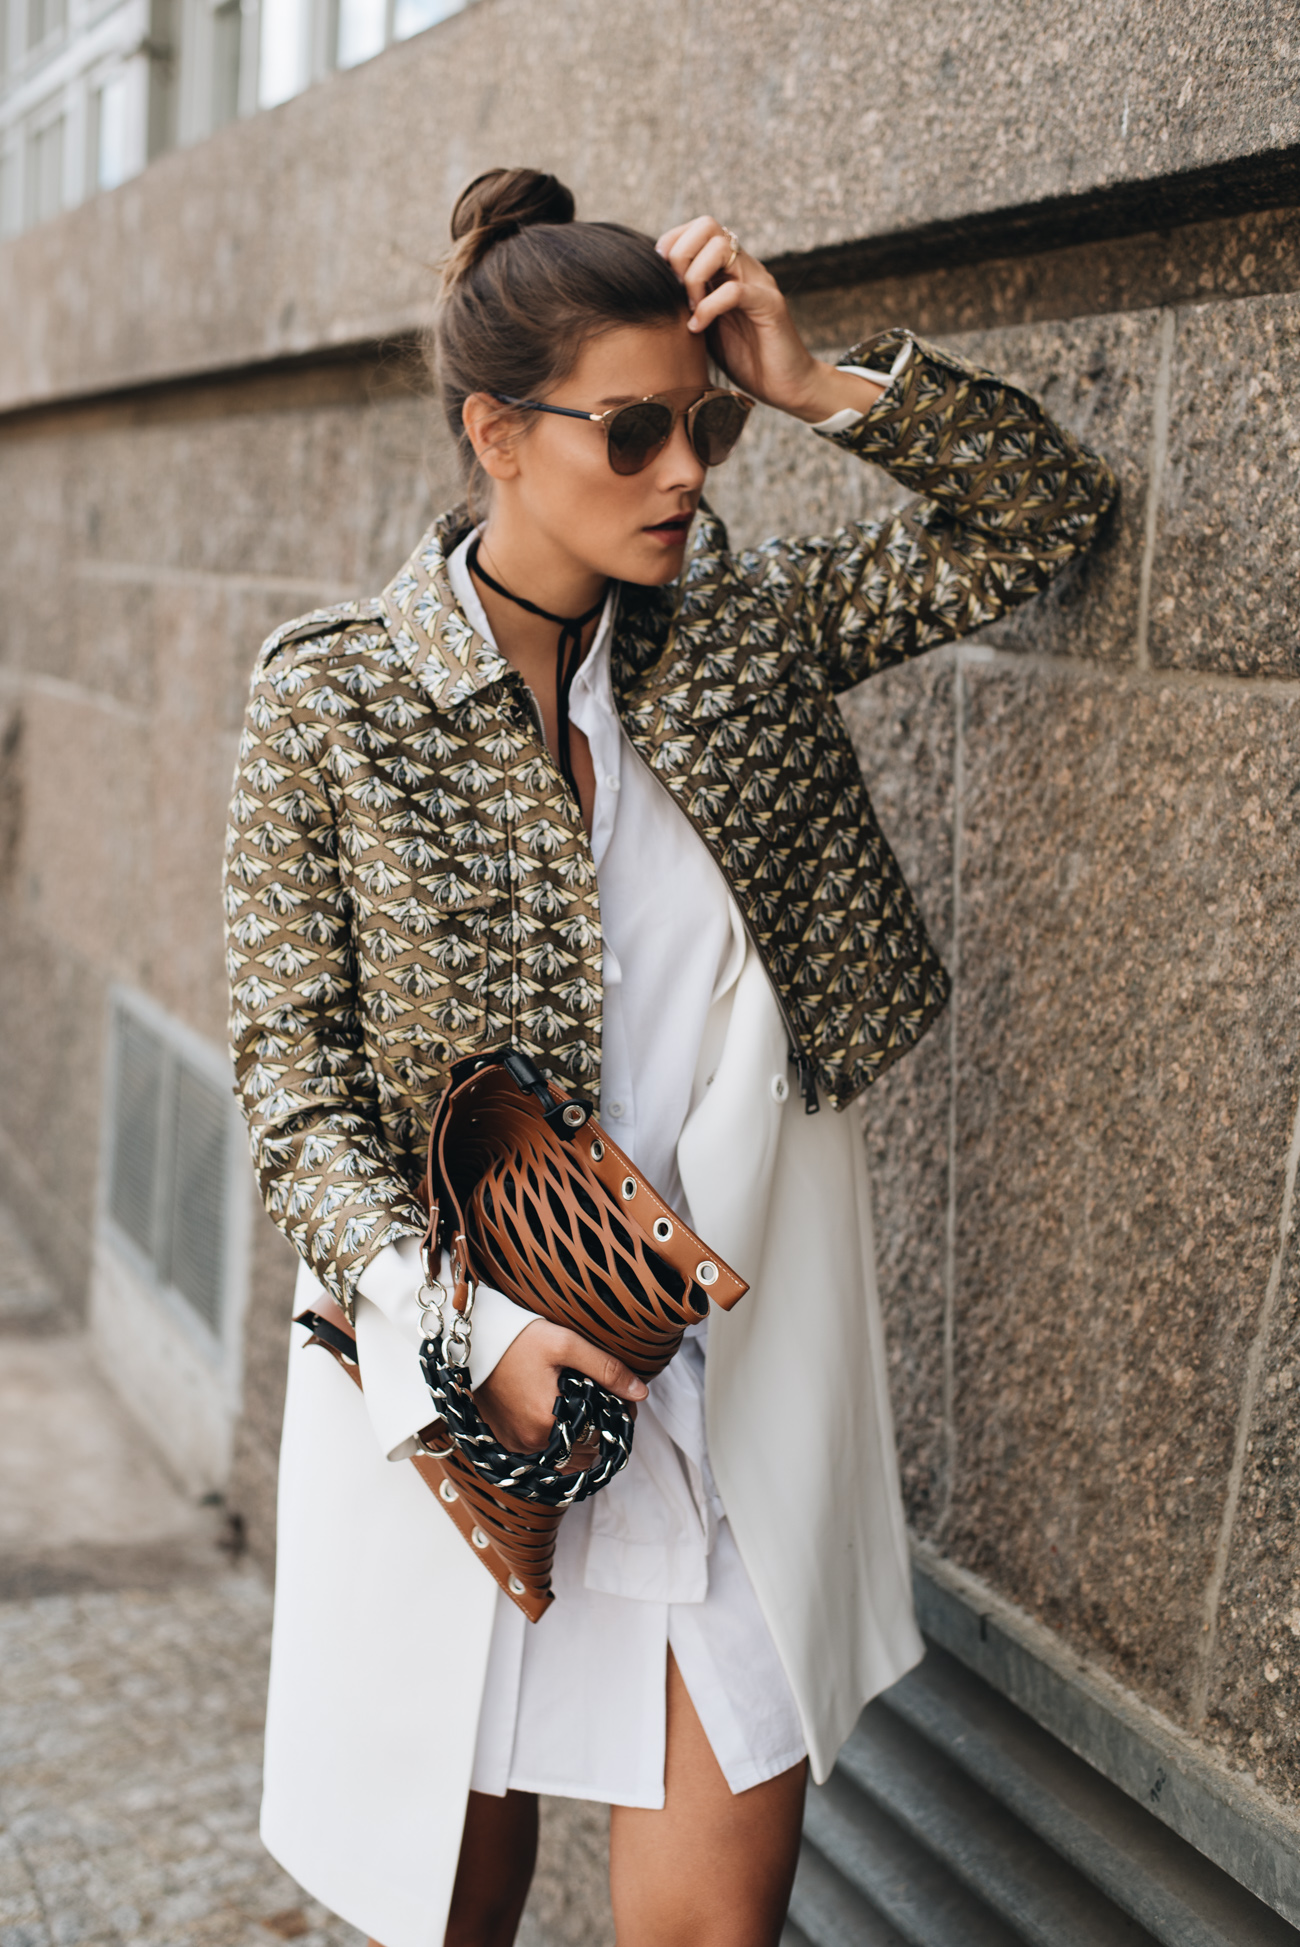 german-fashion-and-lifestyle-blog-blogger-munich-high-quality-fashiioncarpet